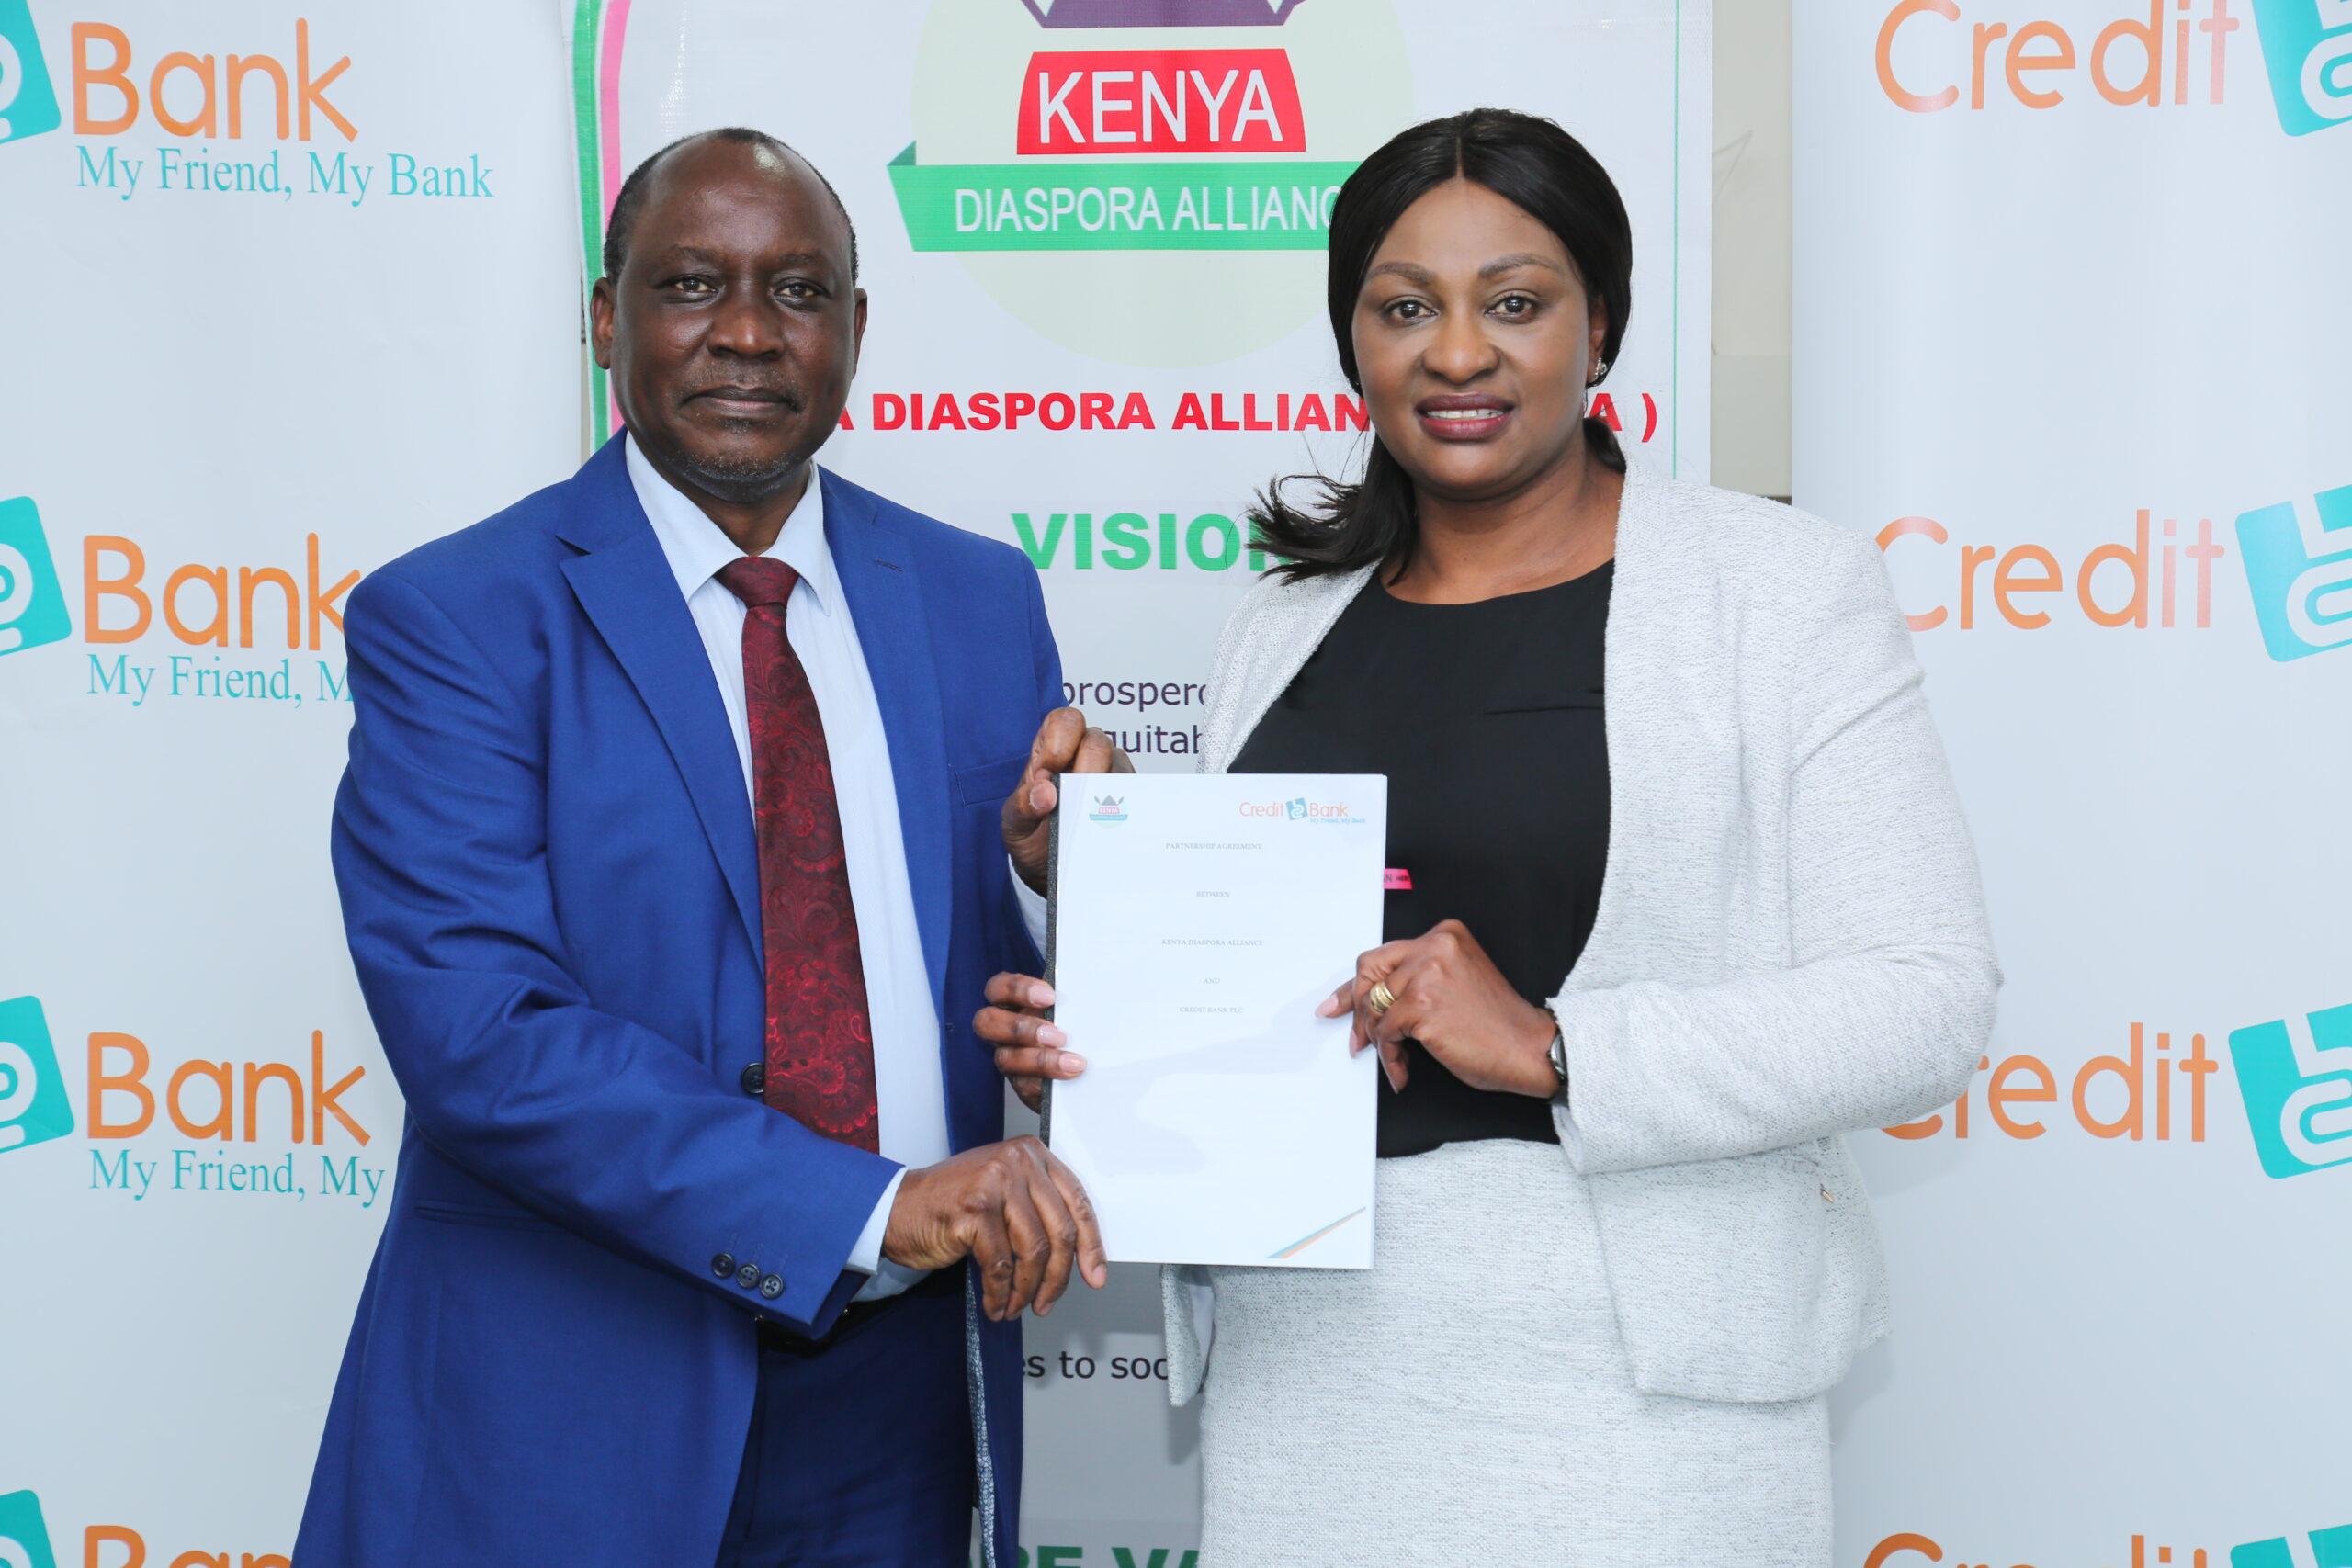 Credit Bank Inks Deal to Empower Kenyans in Diaspora